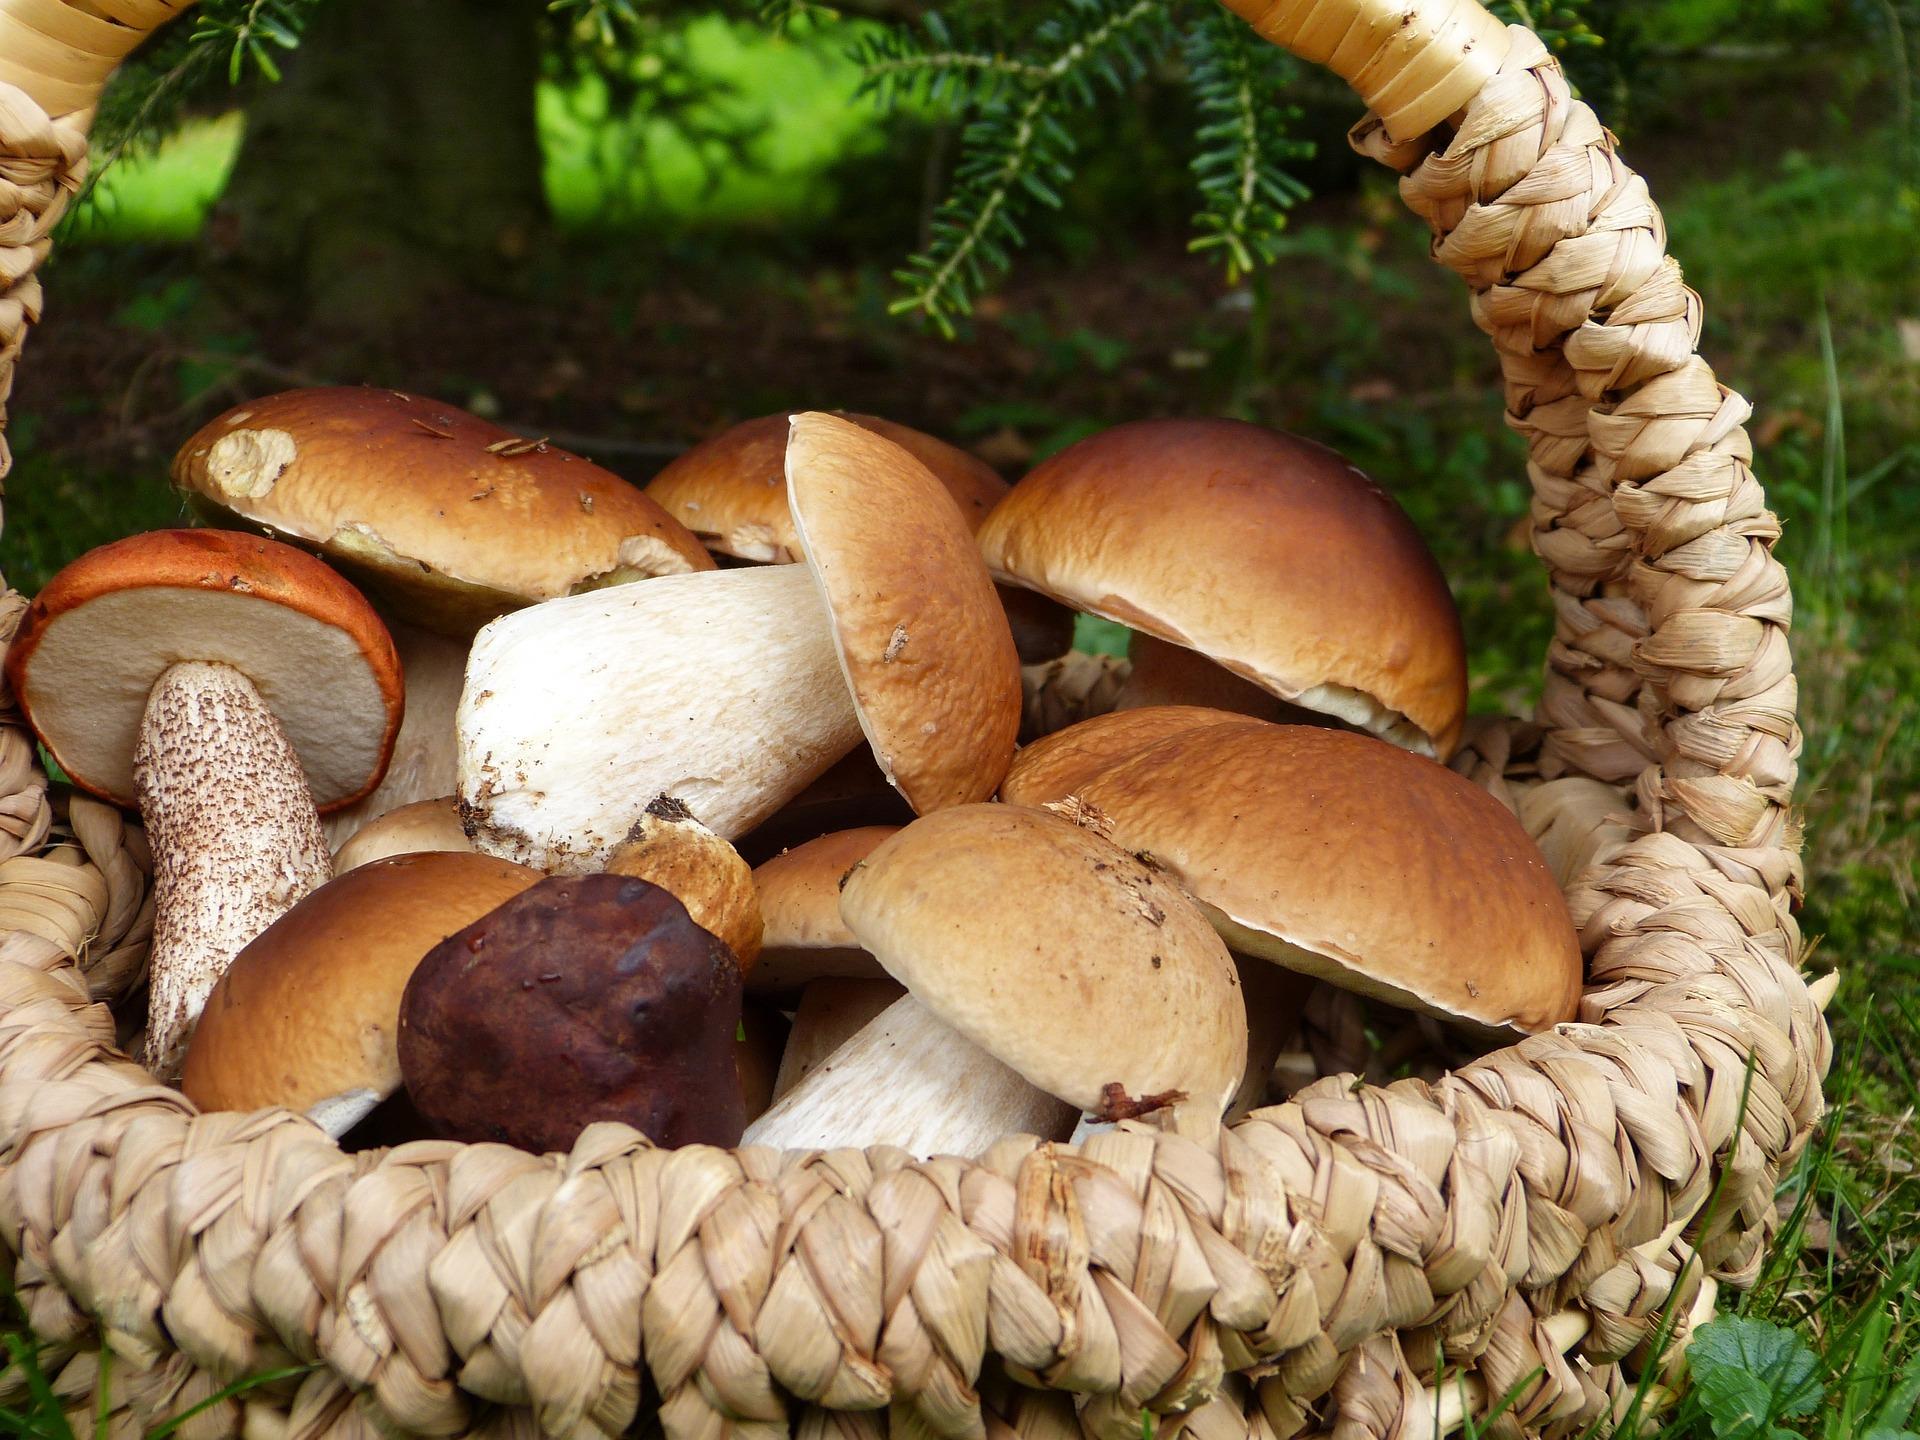 mushrooms-3686917_1920.jpg